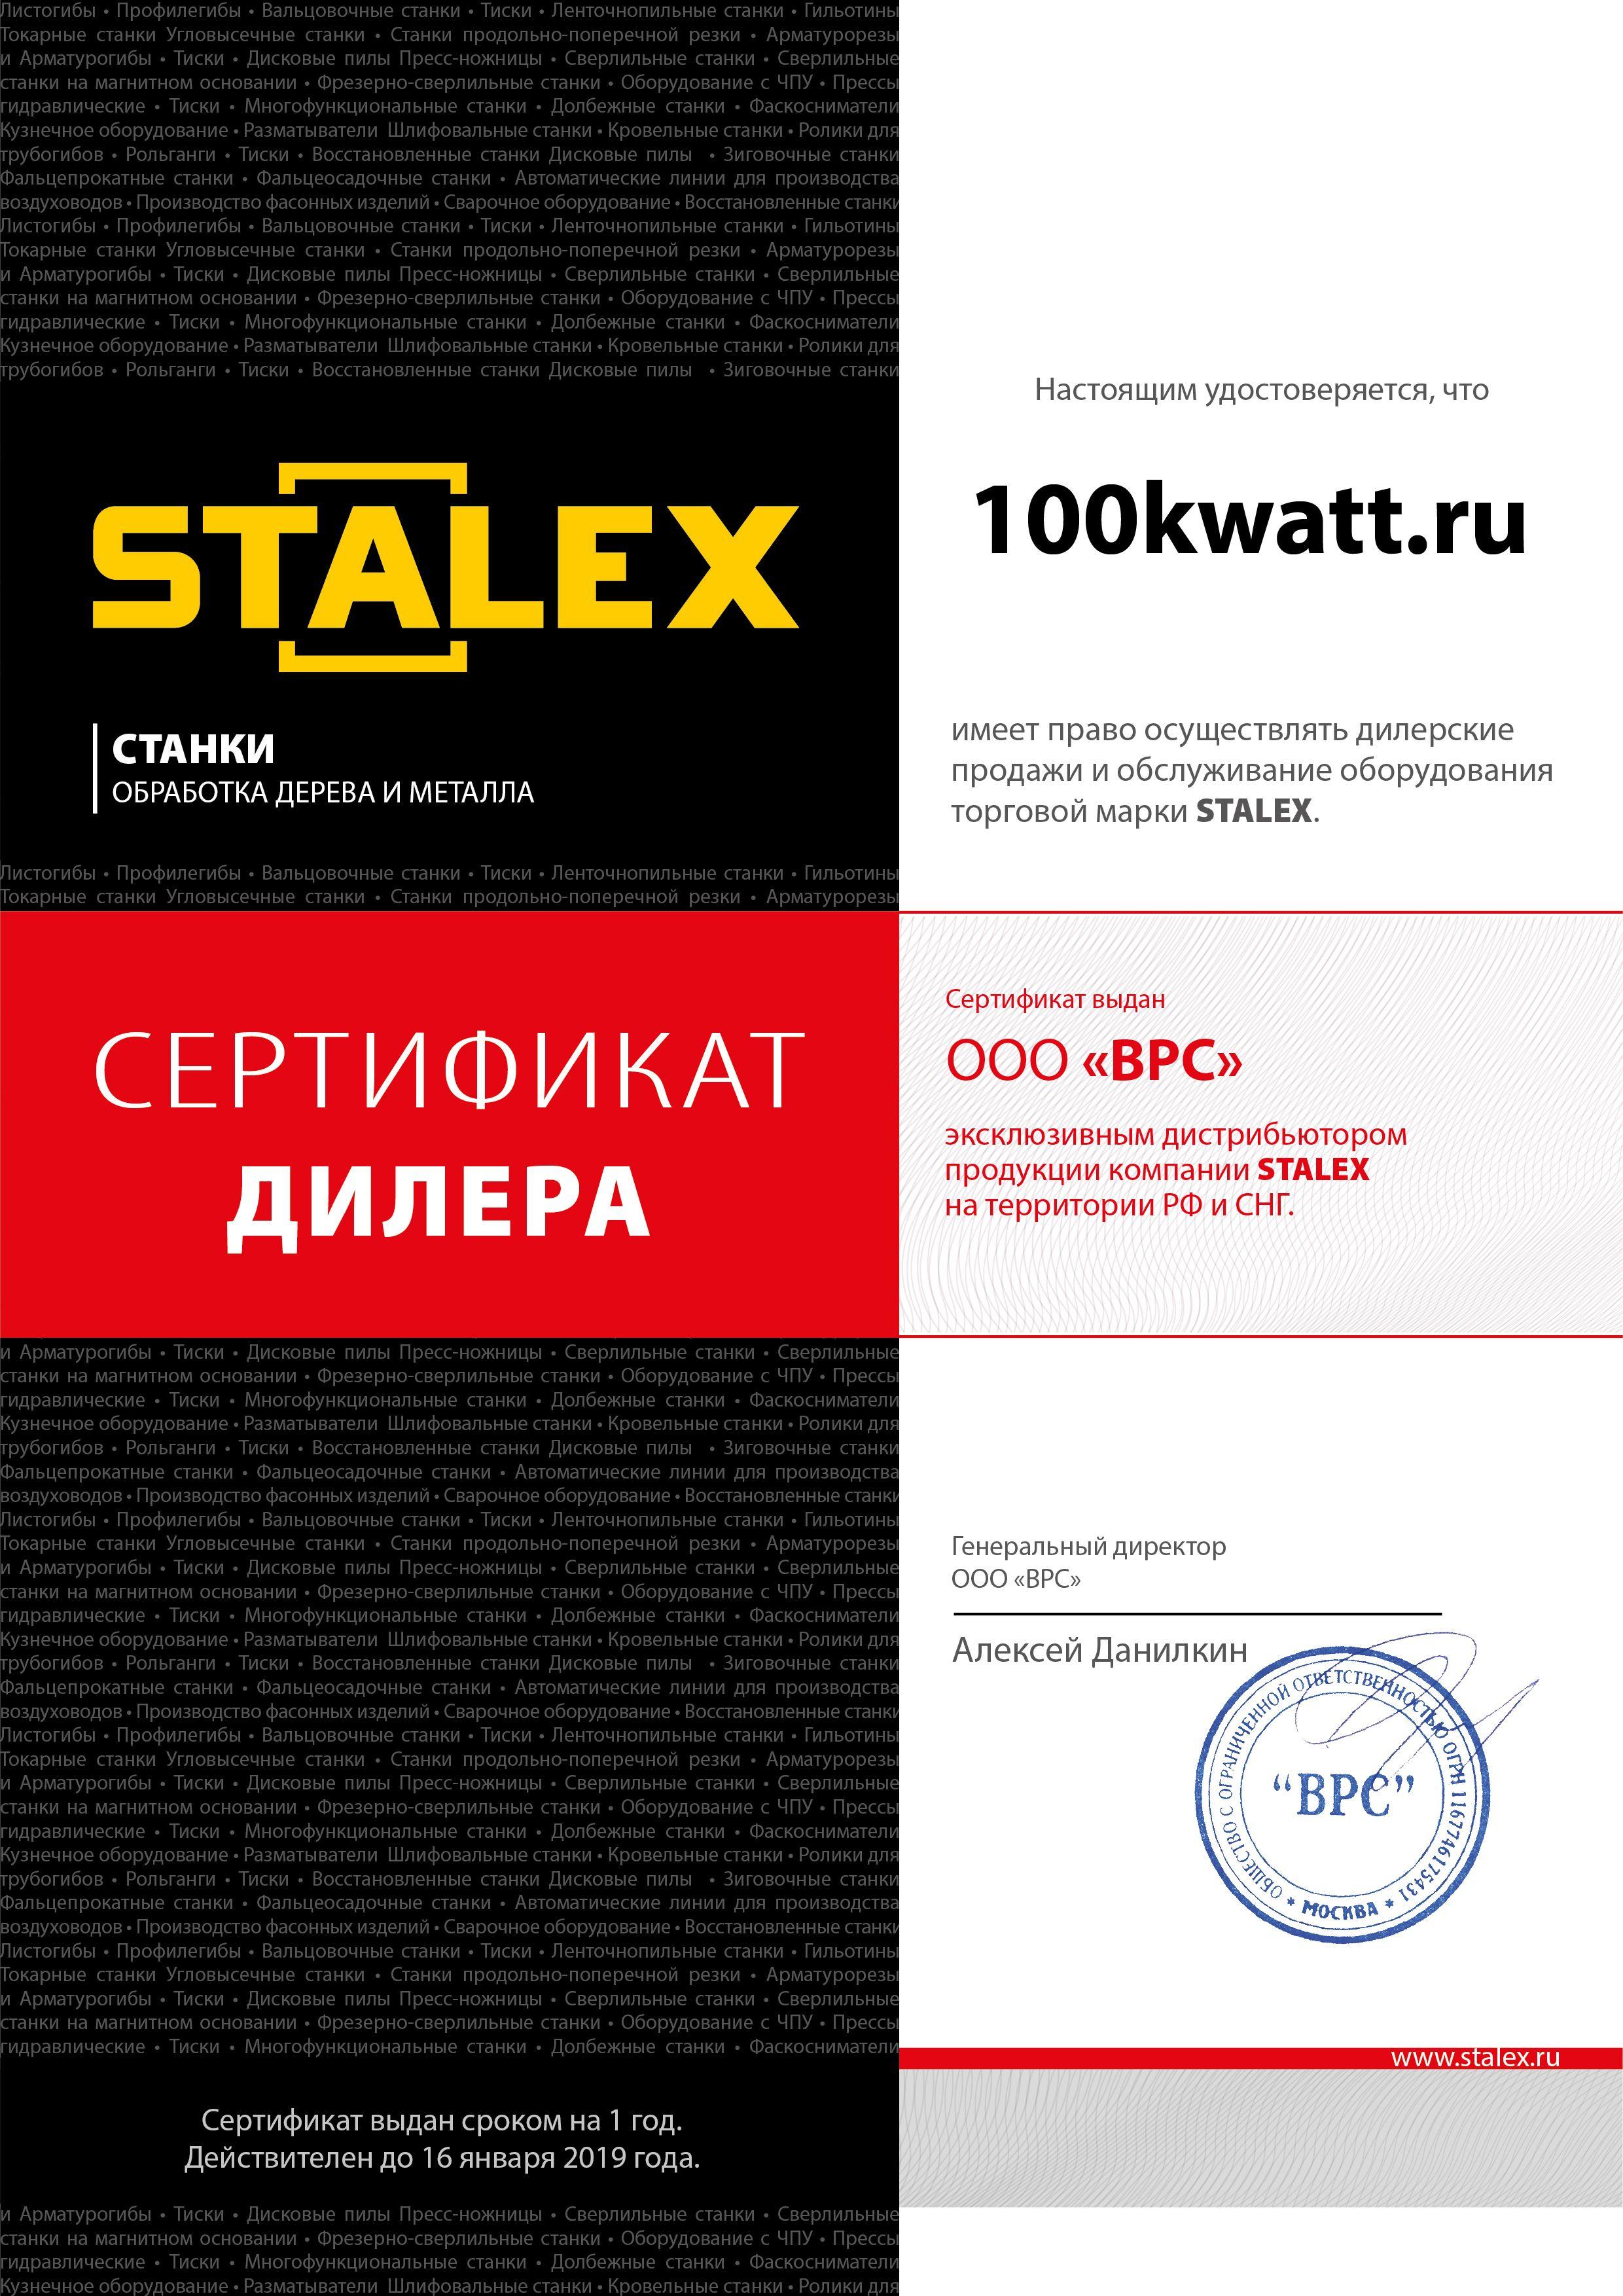 STALEX - Сертификат дилера